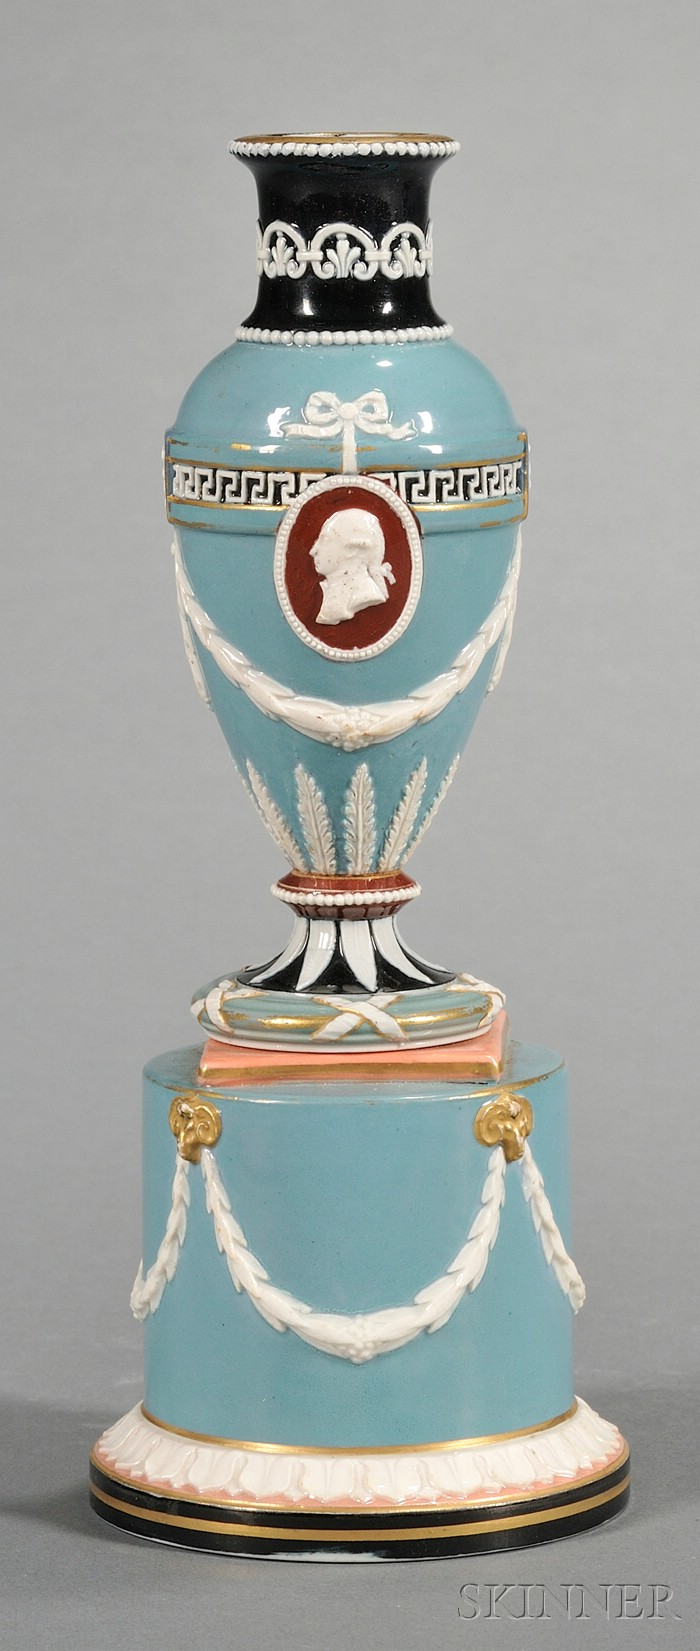 Wedgwood Victoria Ware Portrait Vase